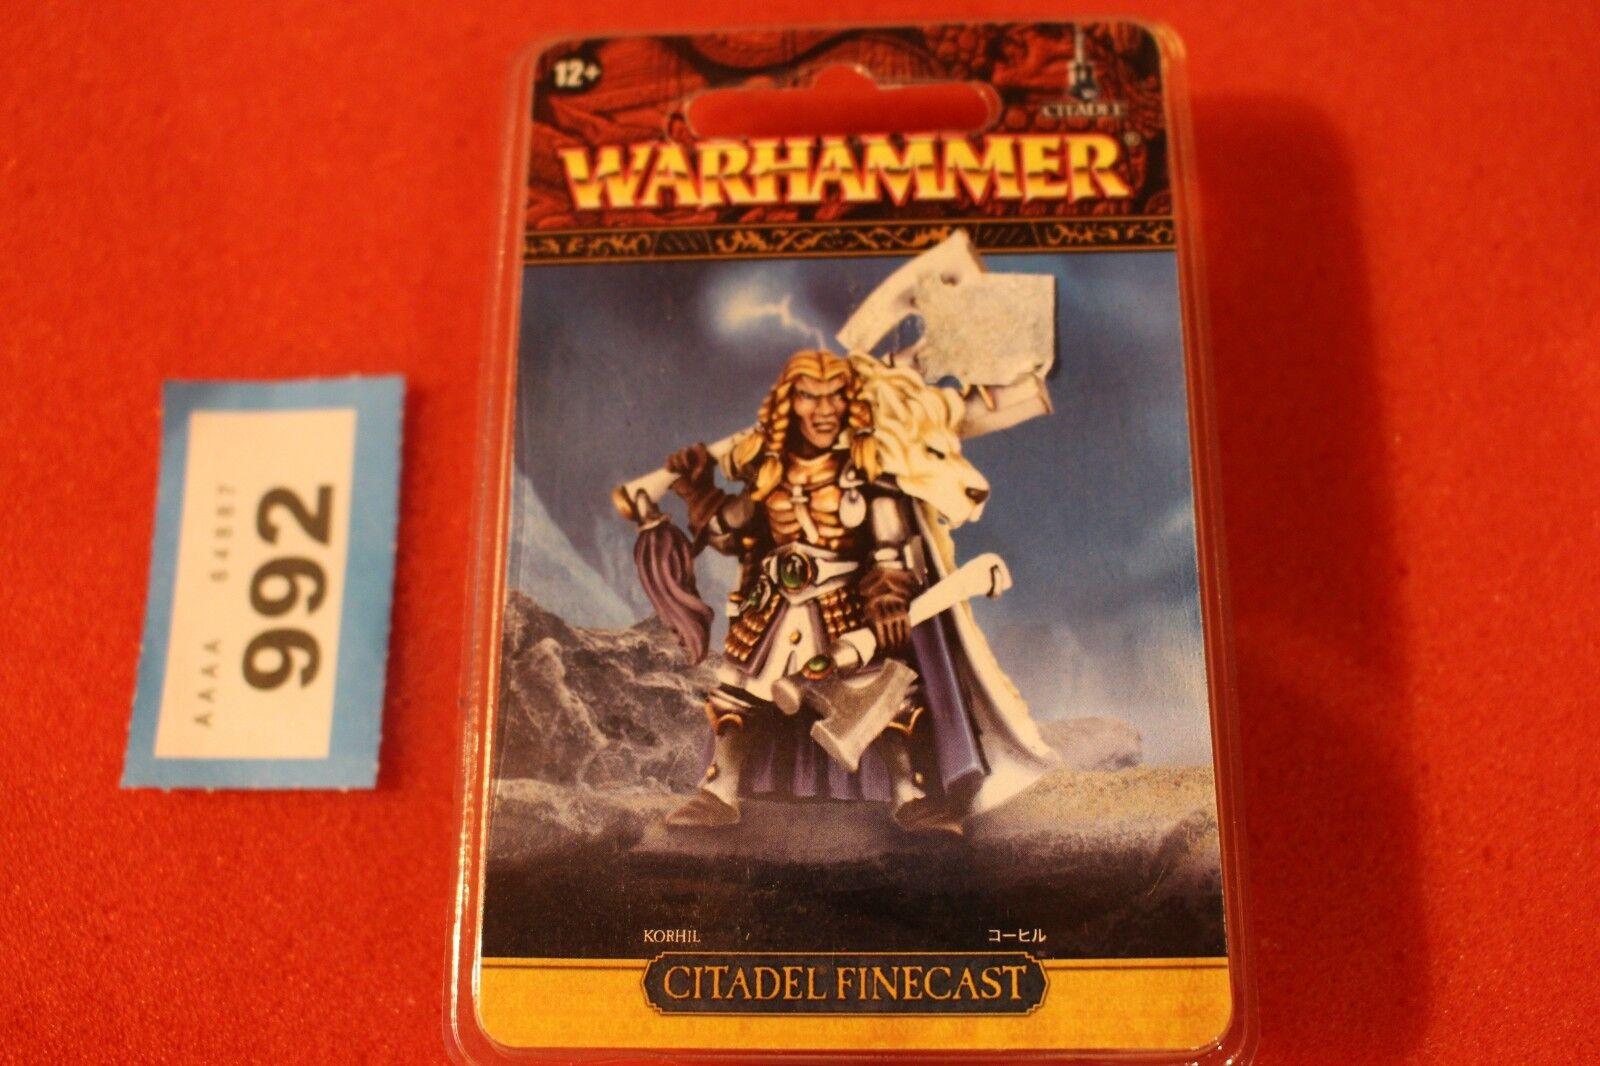 Games Workshop Warhammer High Elf Prince Korhil White Lions Finecast OOP New GW